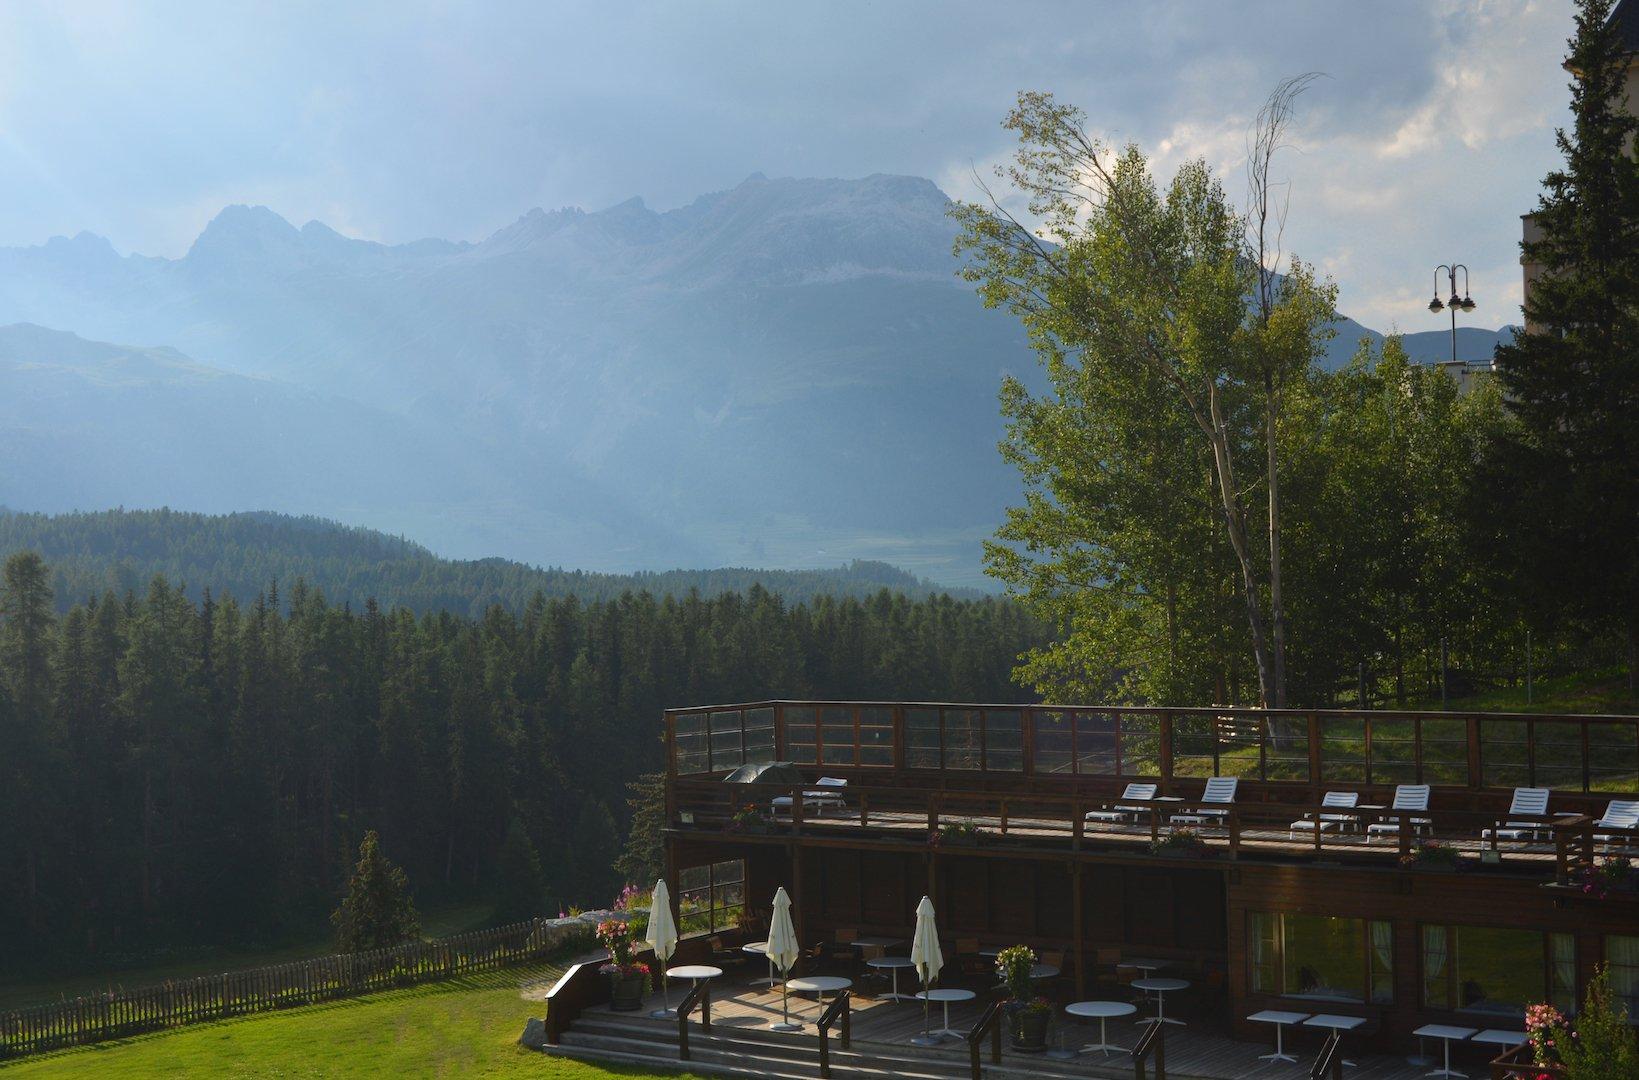 Grand hotel Kronenhof - The Pavilion